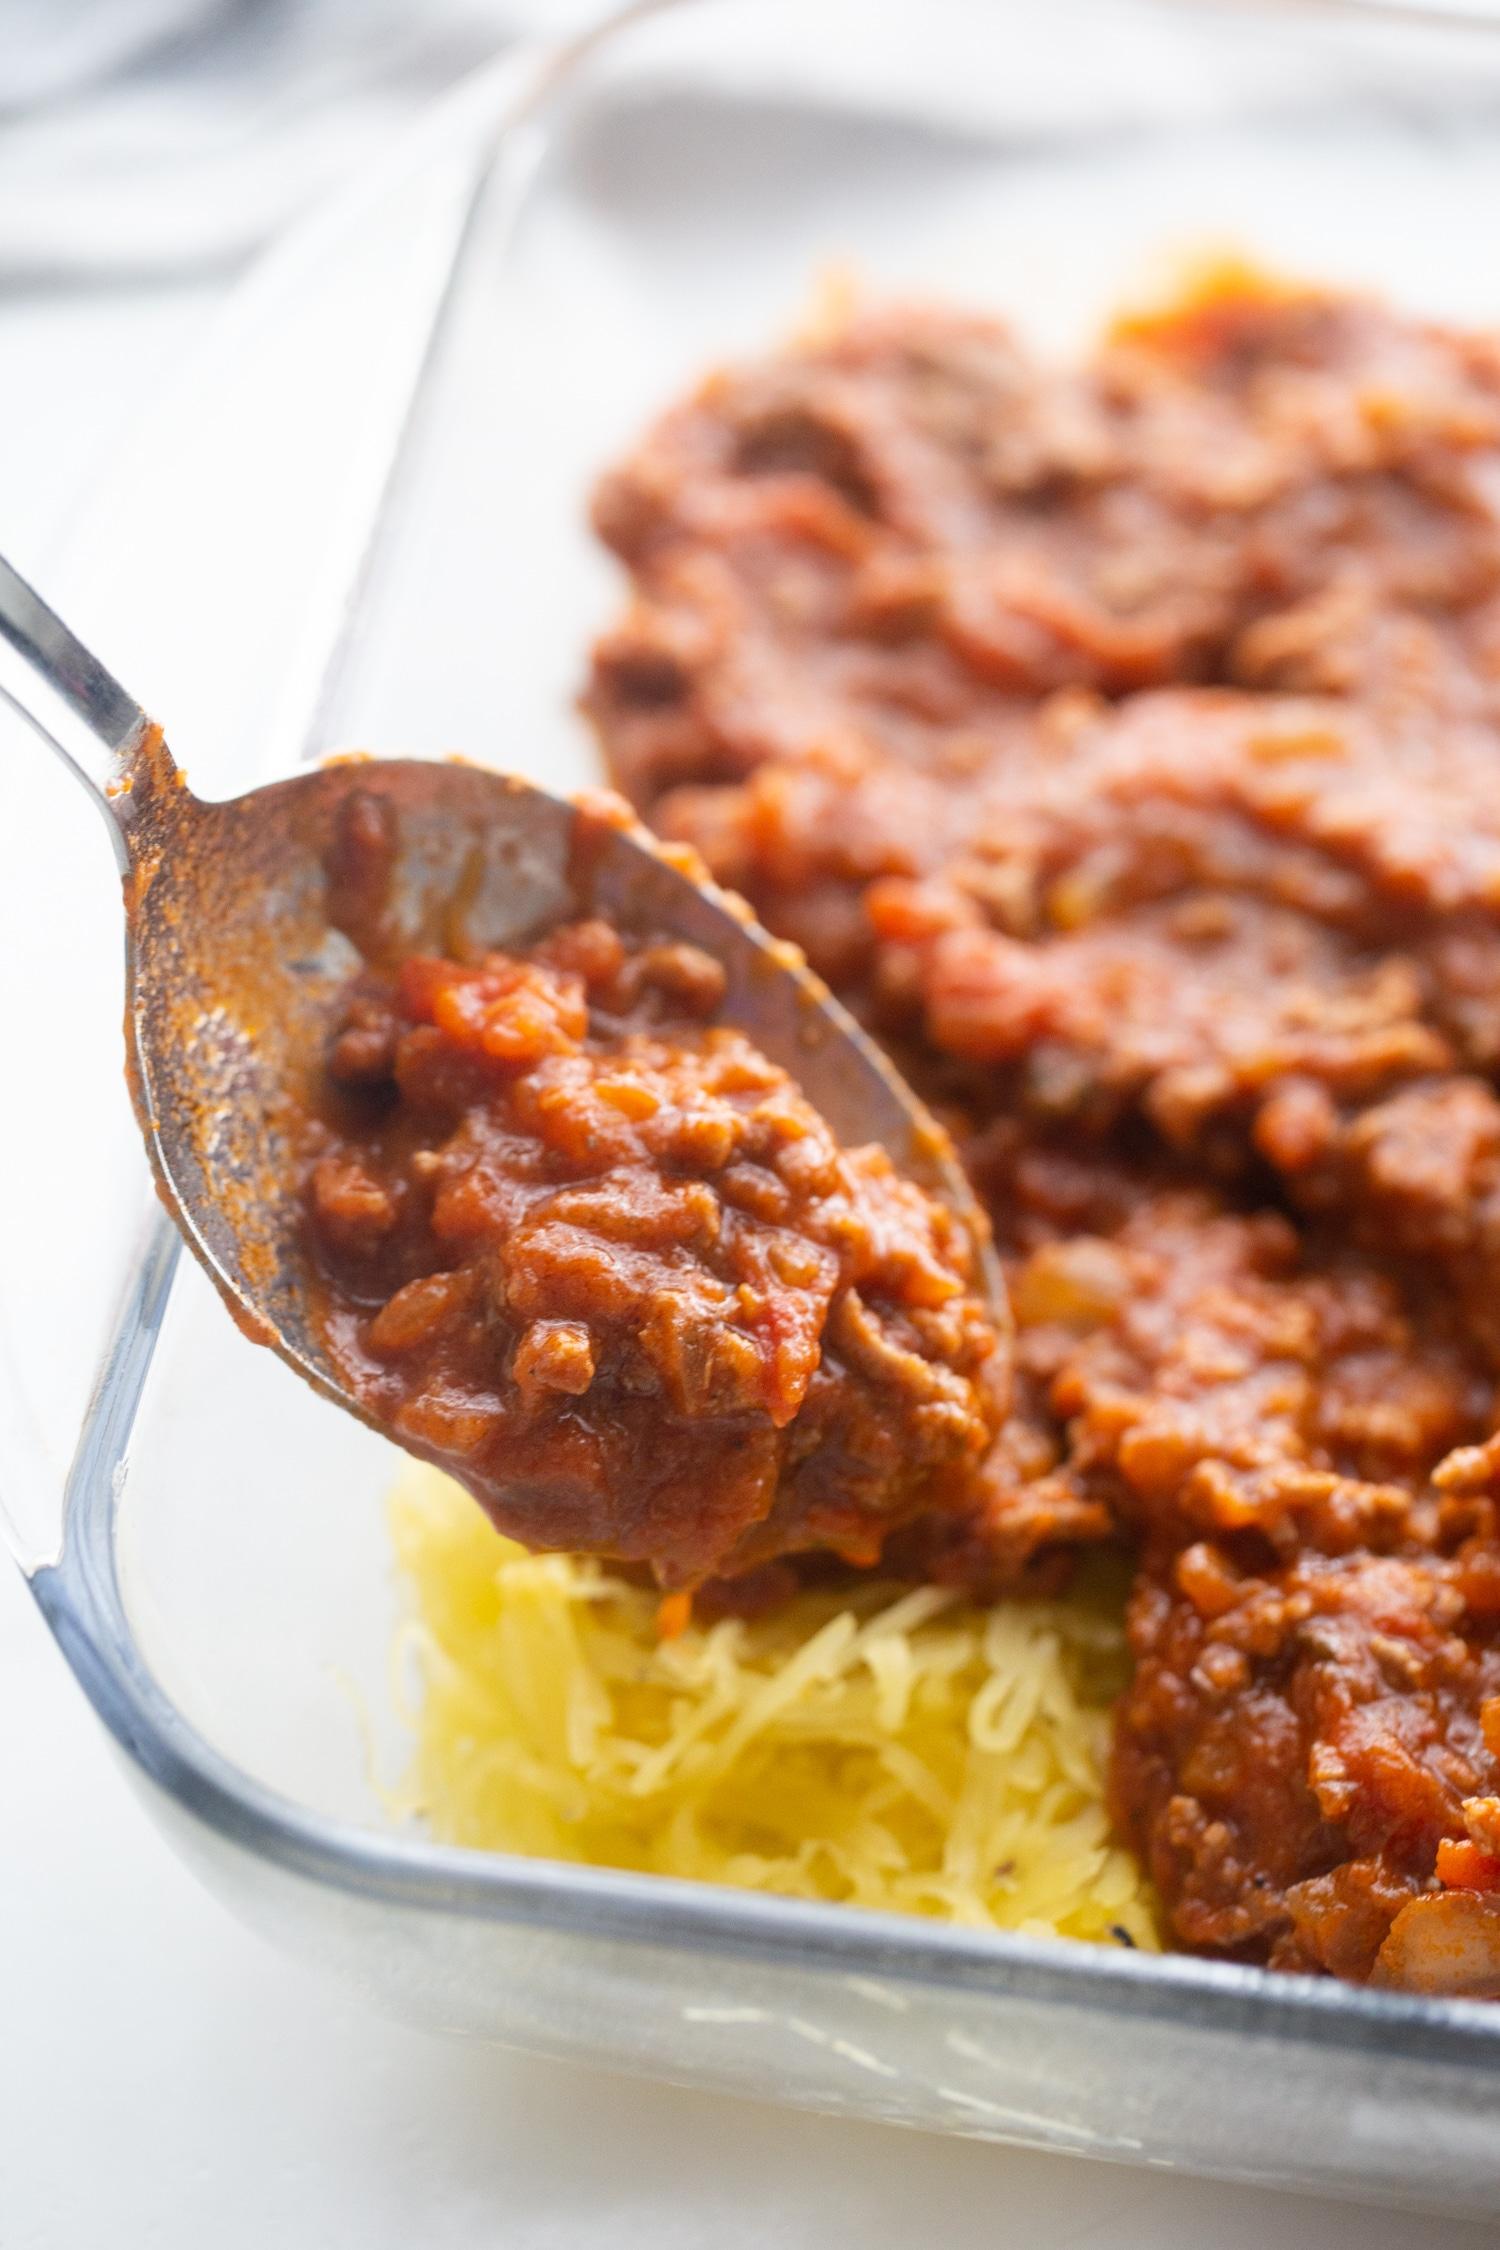 low carb spaghetti sauce on top of spaghetti squash